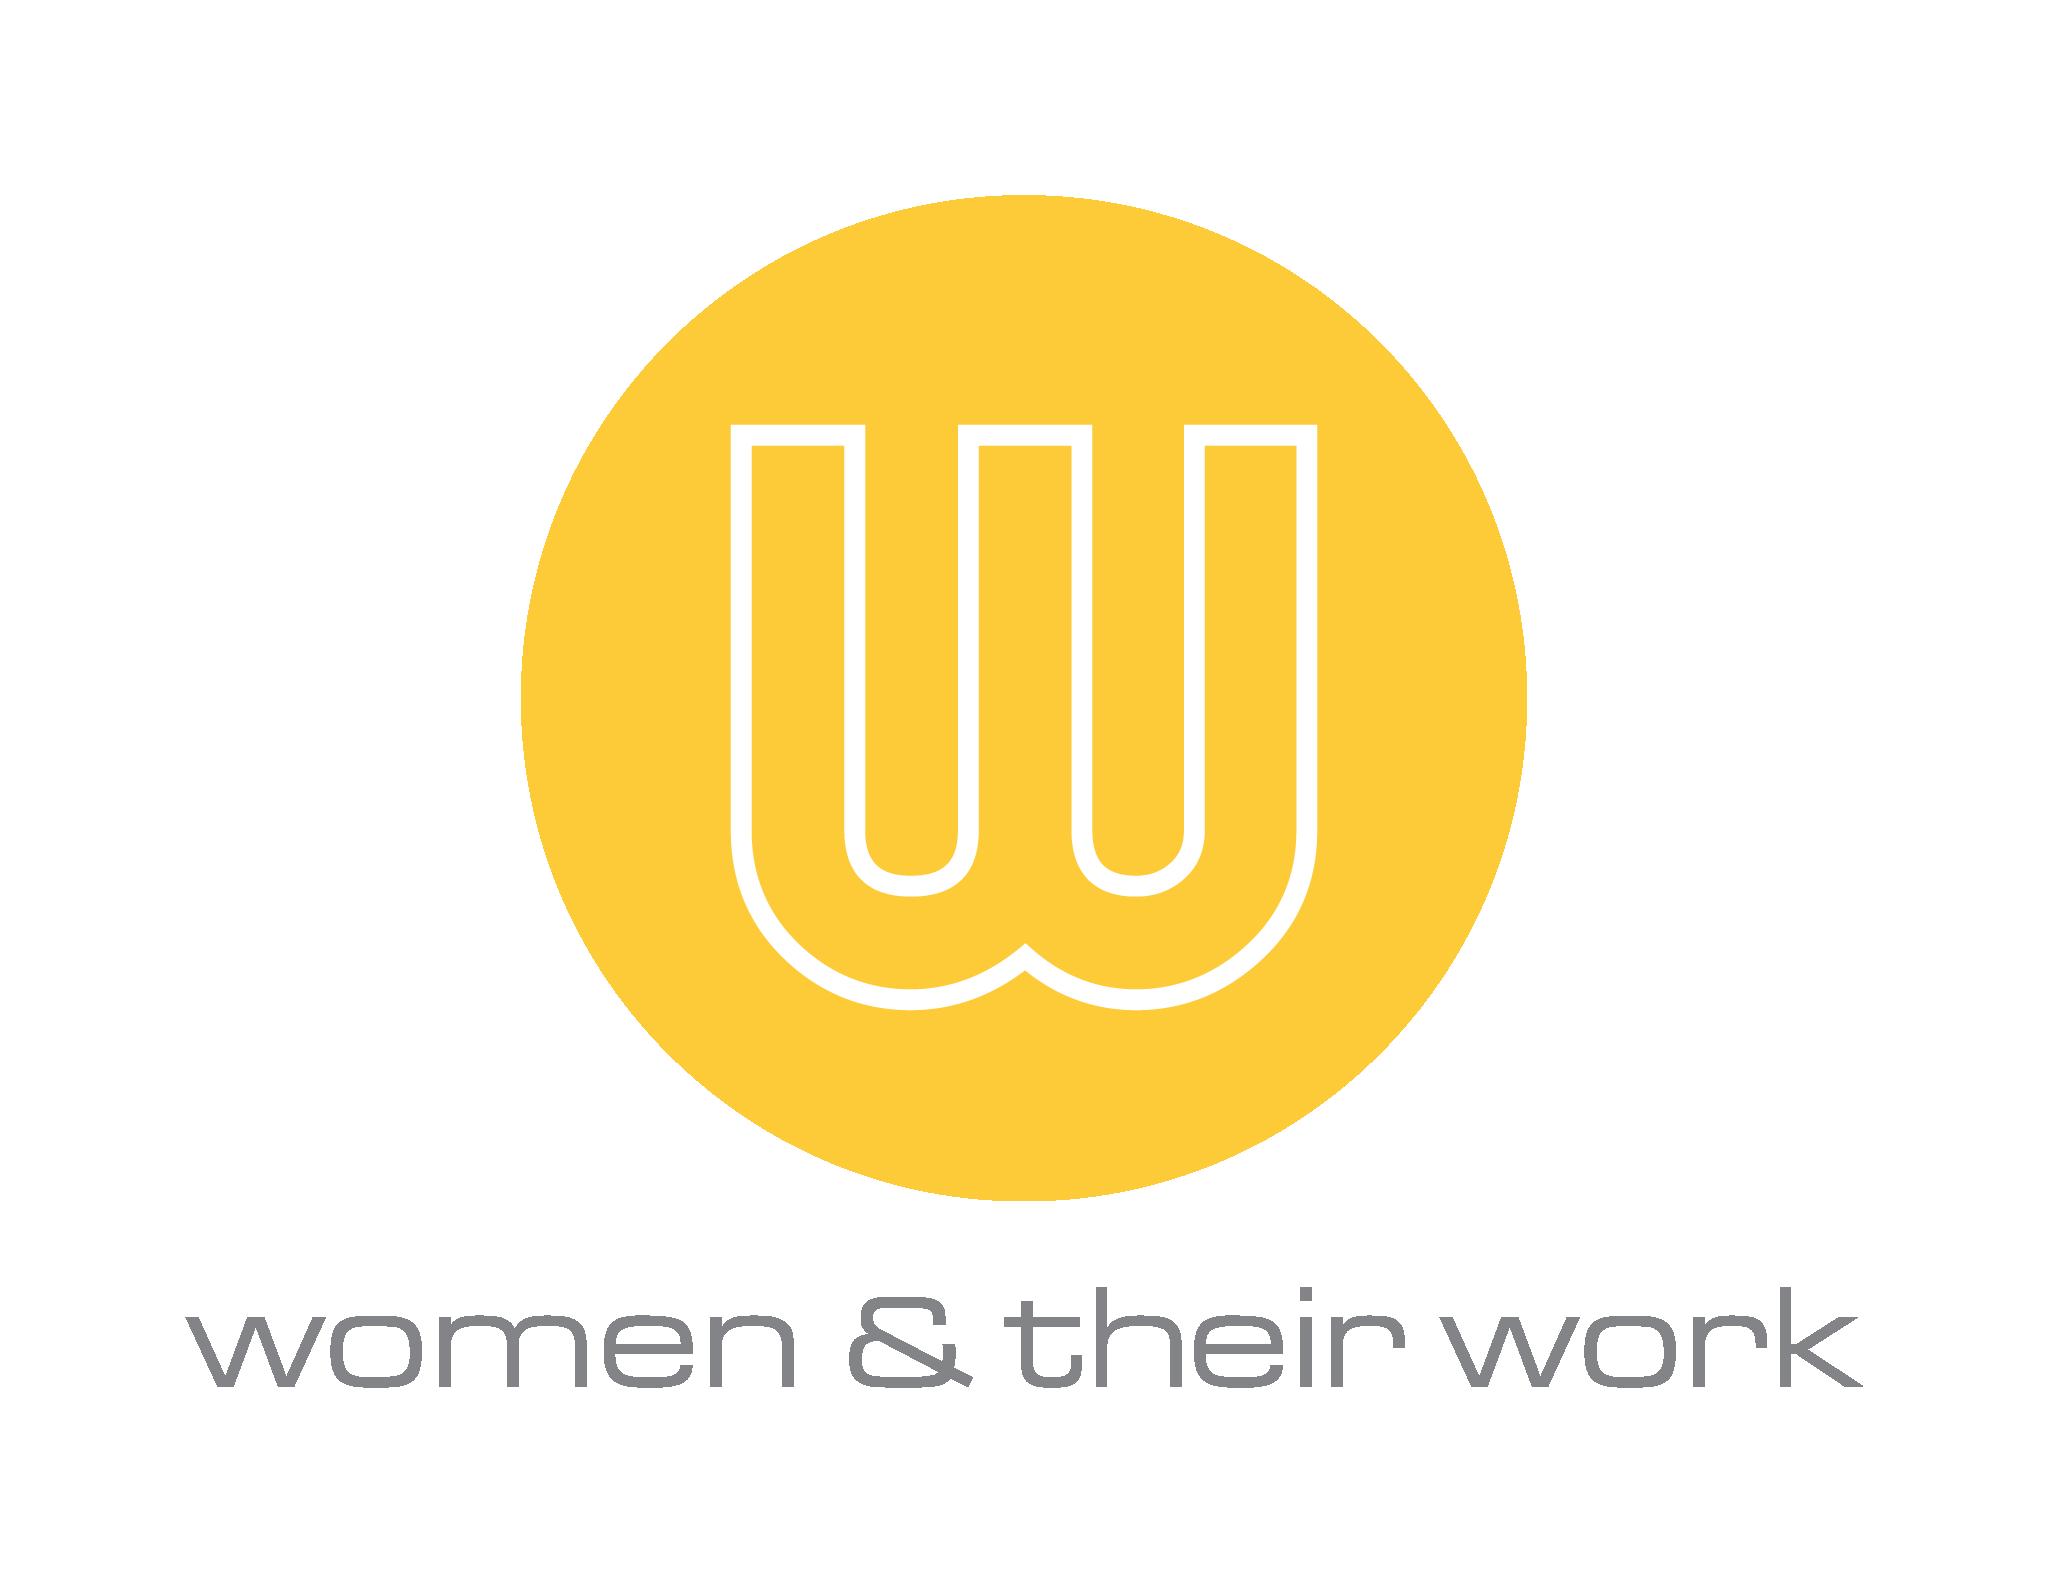 W&TW_logo-text_below-2048px.png